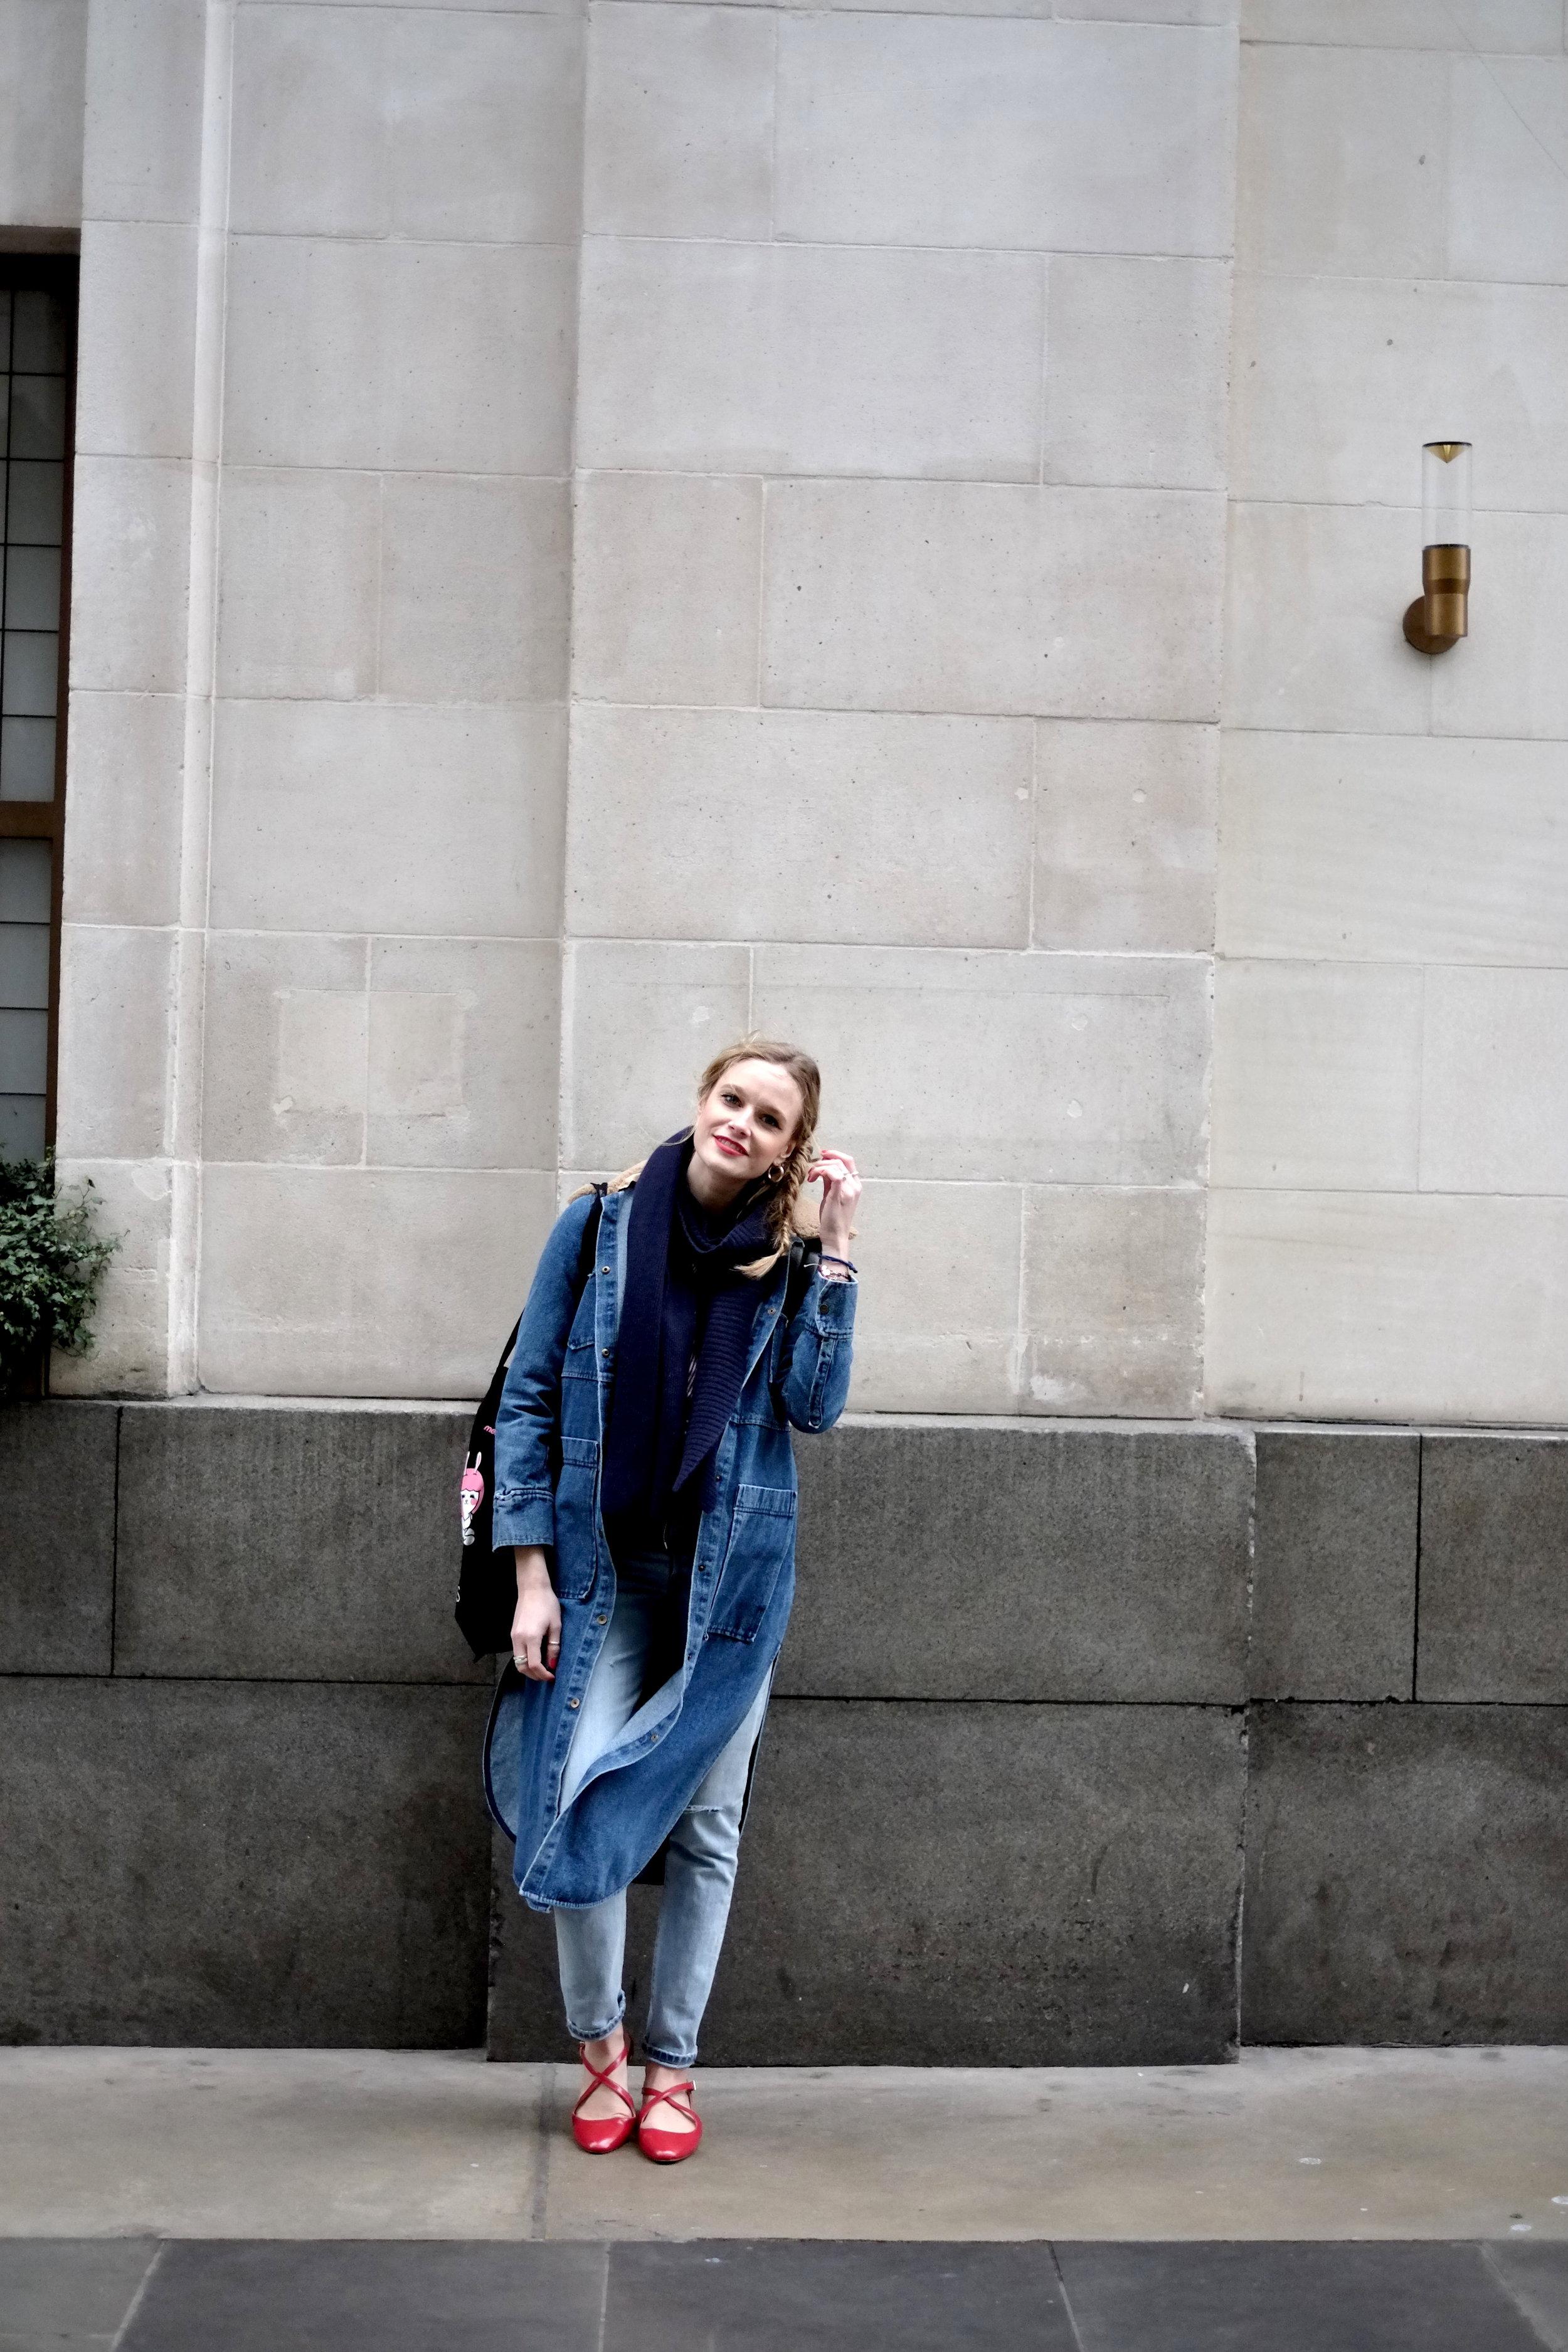 Denim coat by   Nanushka   , Levis 501, sandals Zara, Blouse Zara, Scarf and other stories